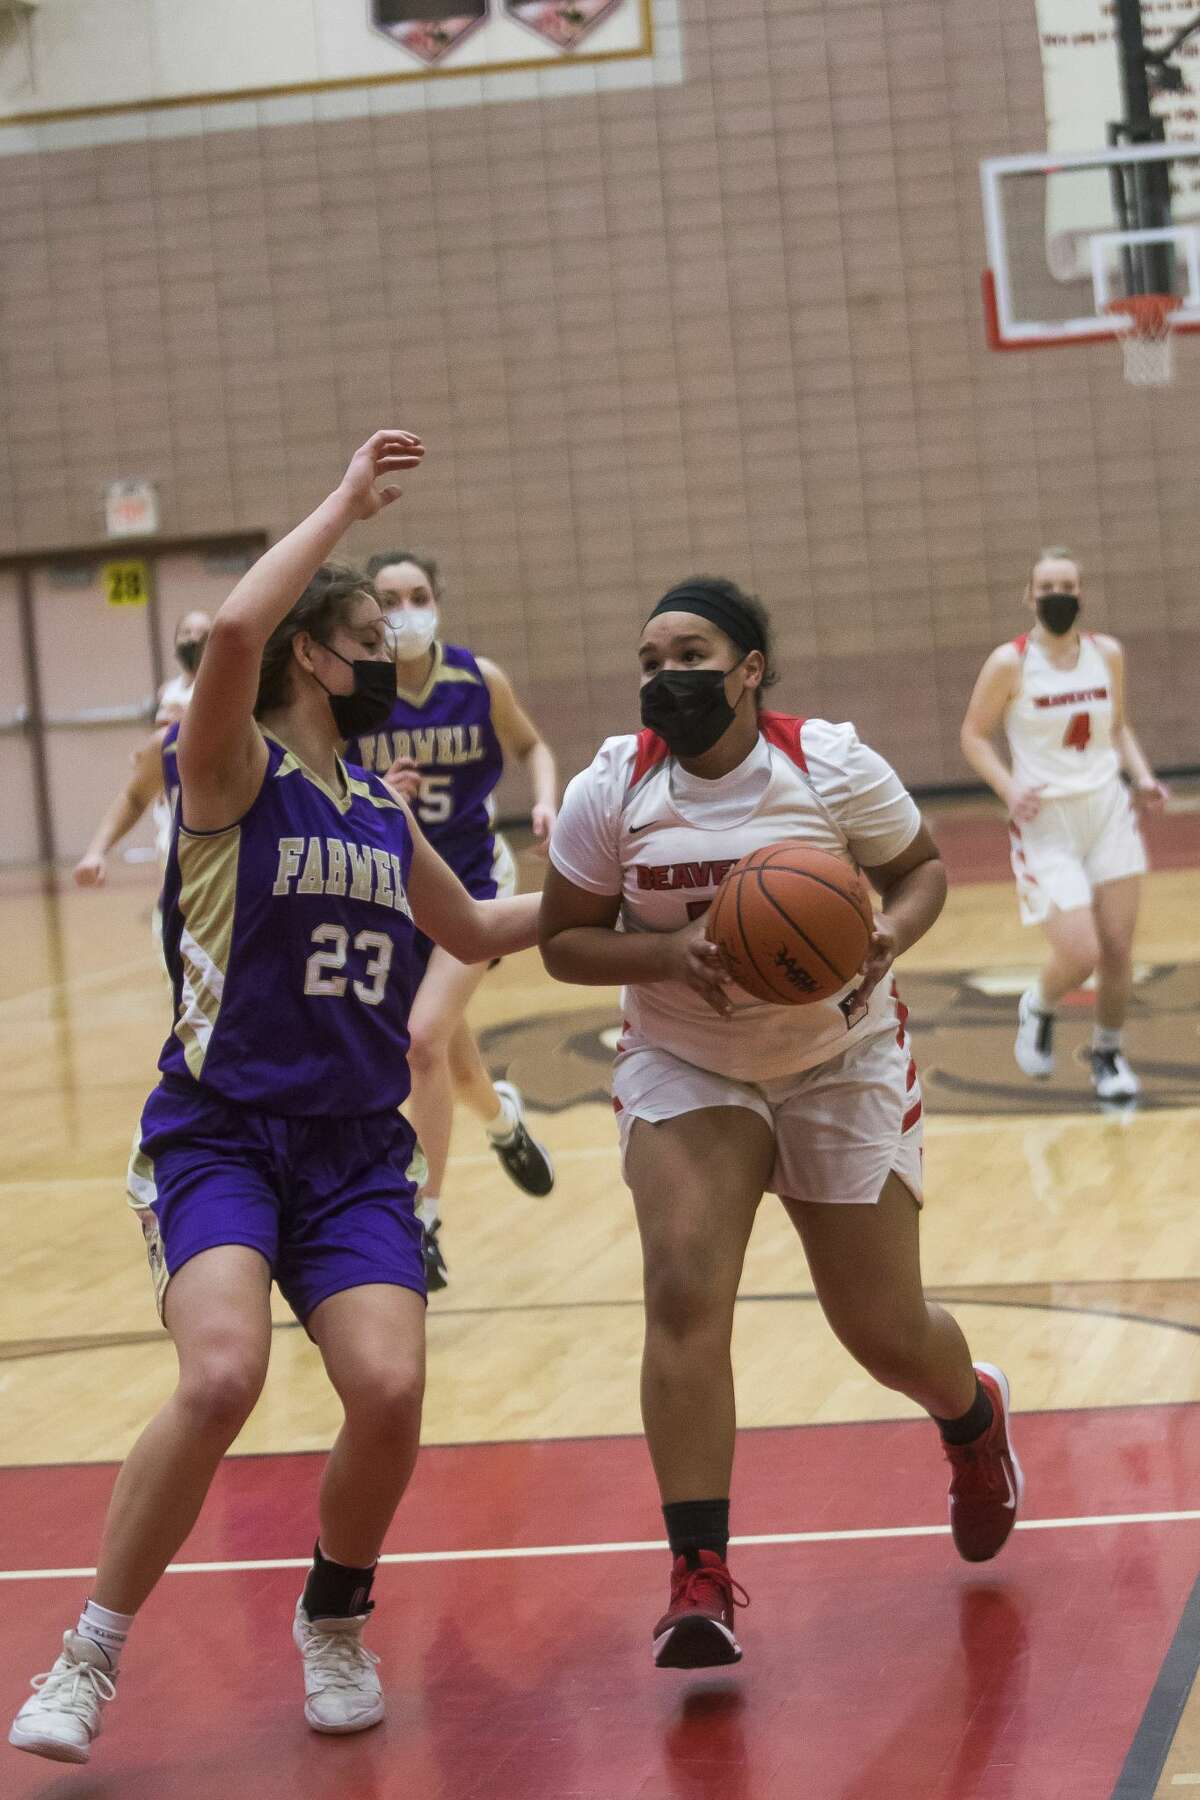 Beaverton's Leiyah Mungin dribbles toward the basket during the Beavers' game against Farwell Monday, March 15, 2021 at Beaverton High School. (Katy Kildee/kkildee@mdn.net)